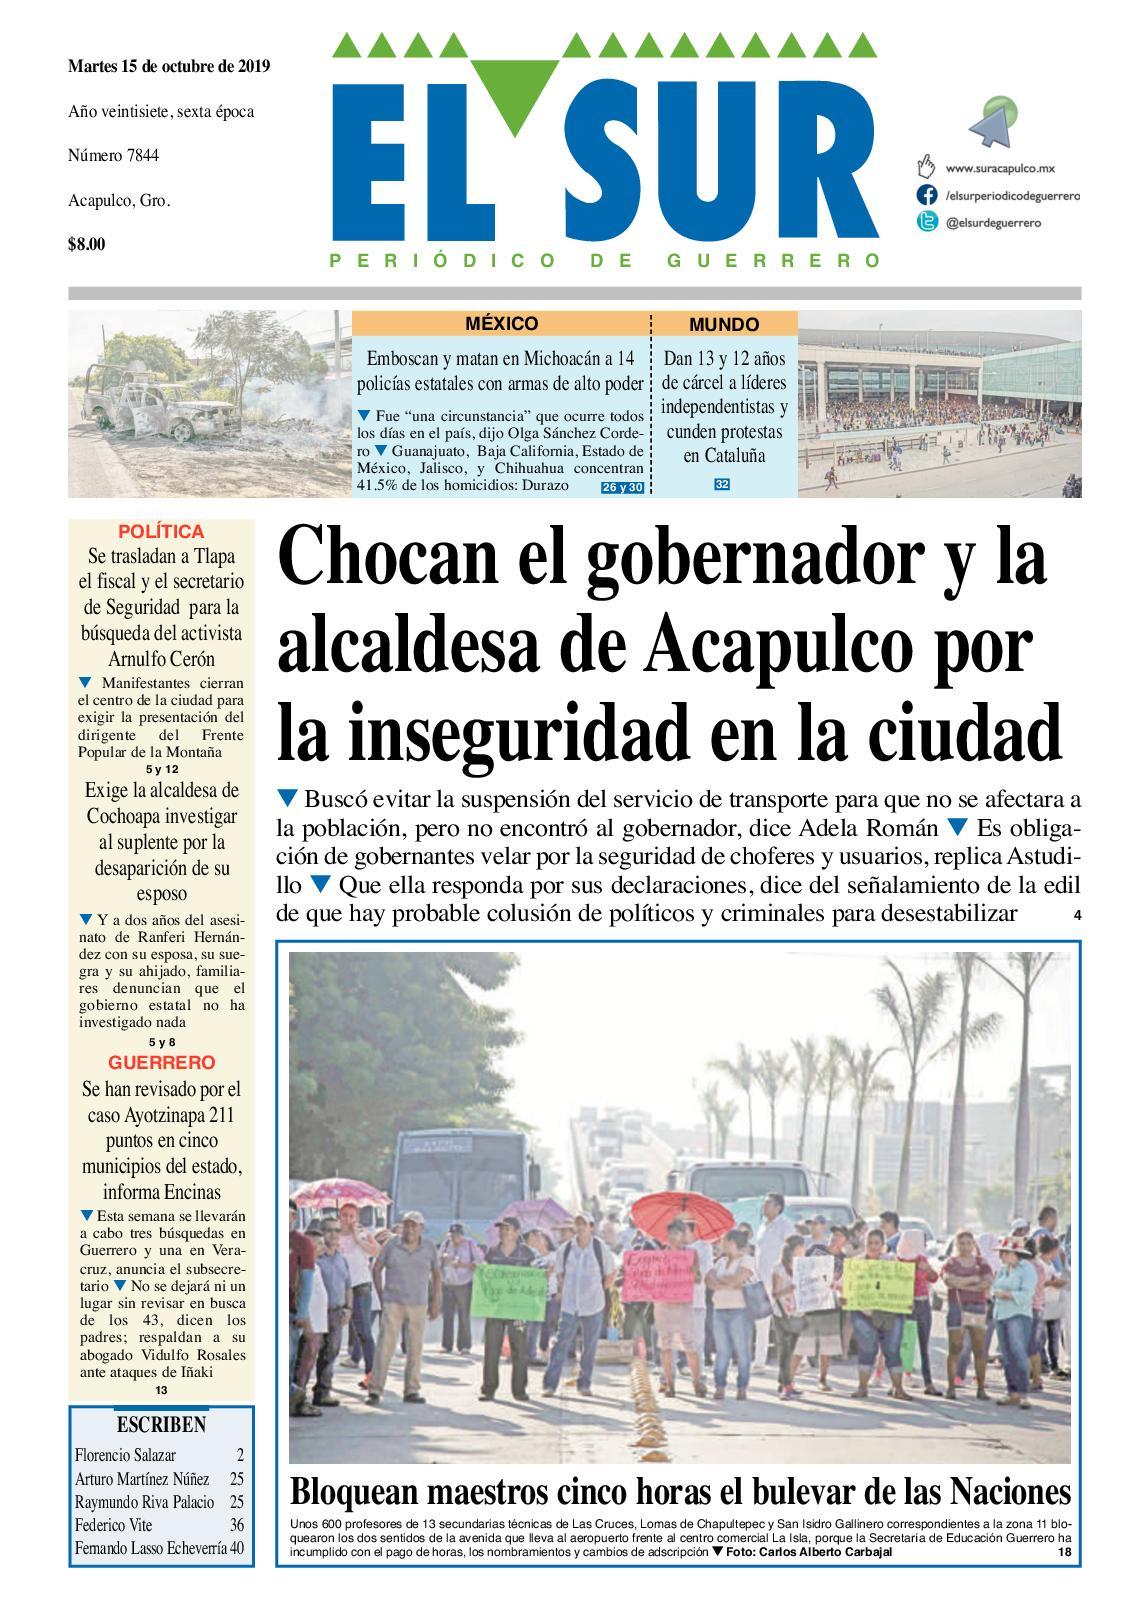 Mujeres solteras Acapulco no te expectacula